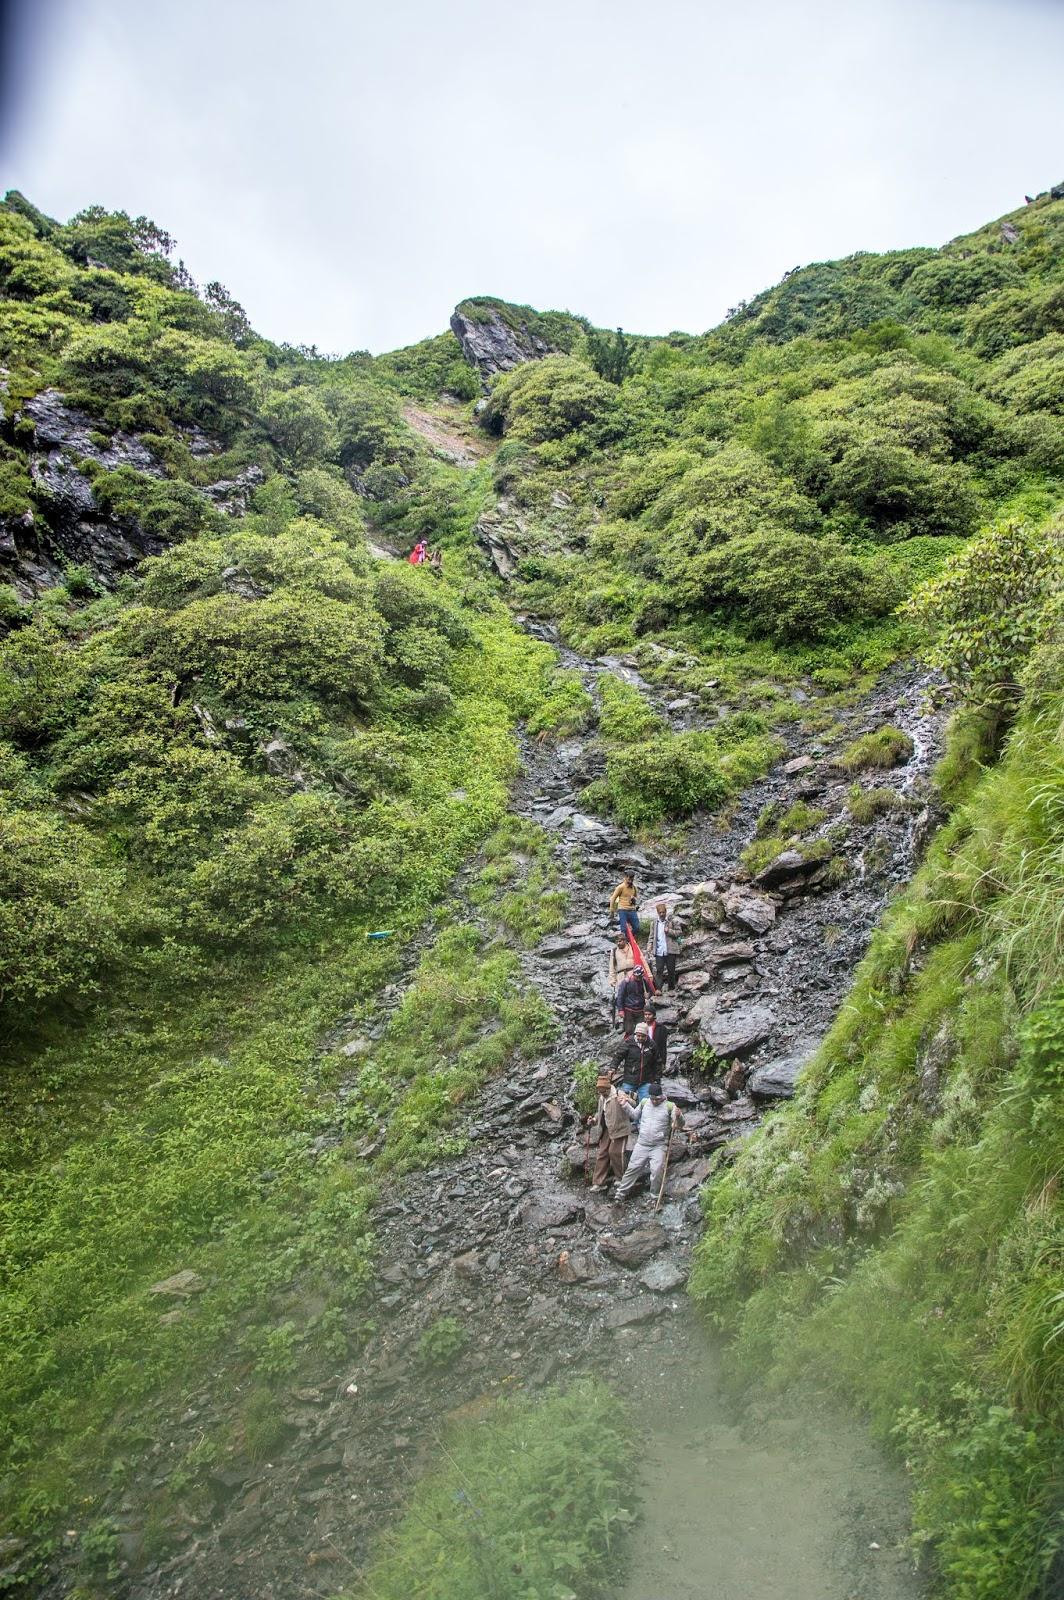 Treacherous path in Srikhand Mahadev Yatra